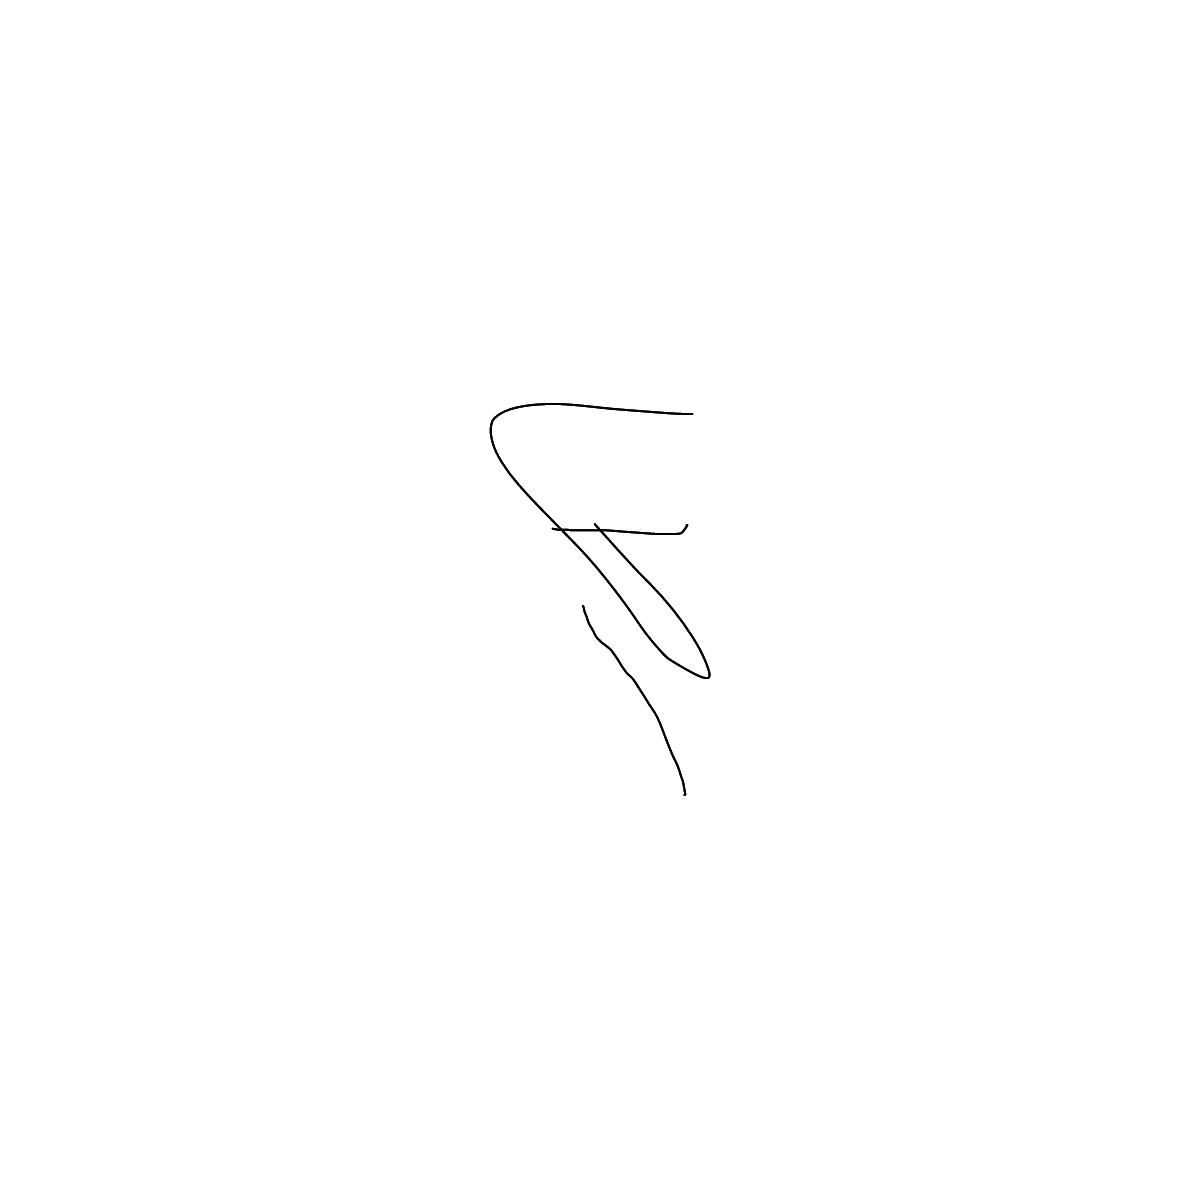 BAAAM drawing#235 lat:53.0247192382812500lng: -0.4256666600704193